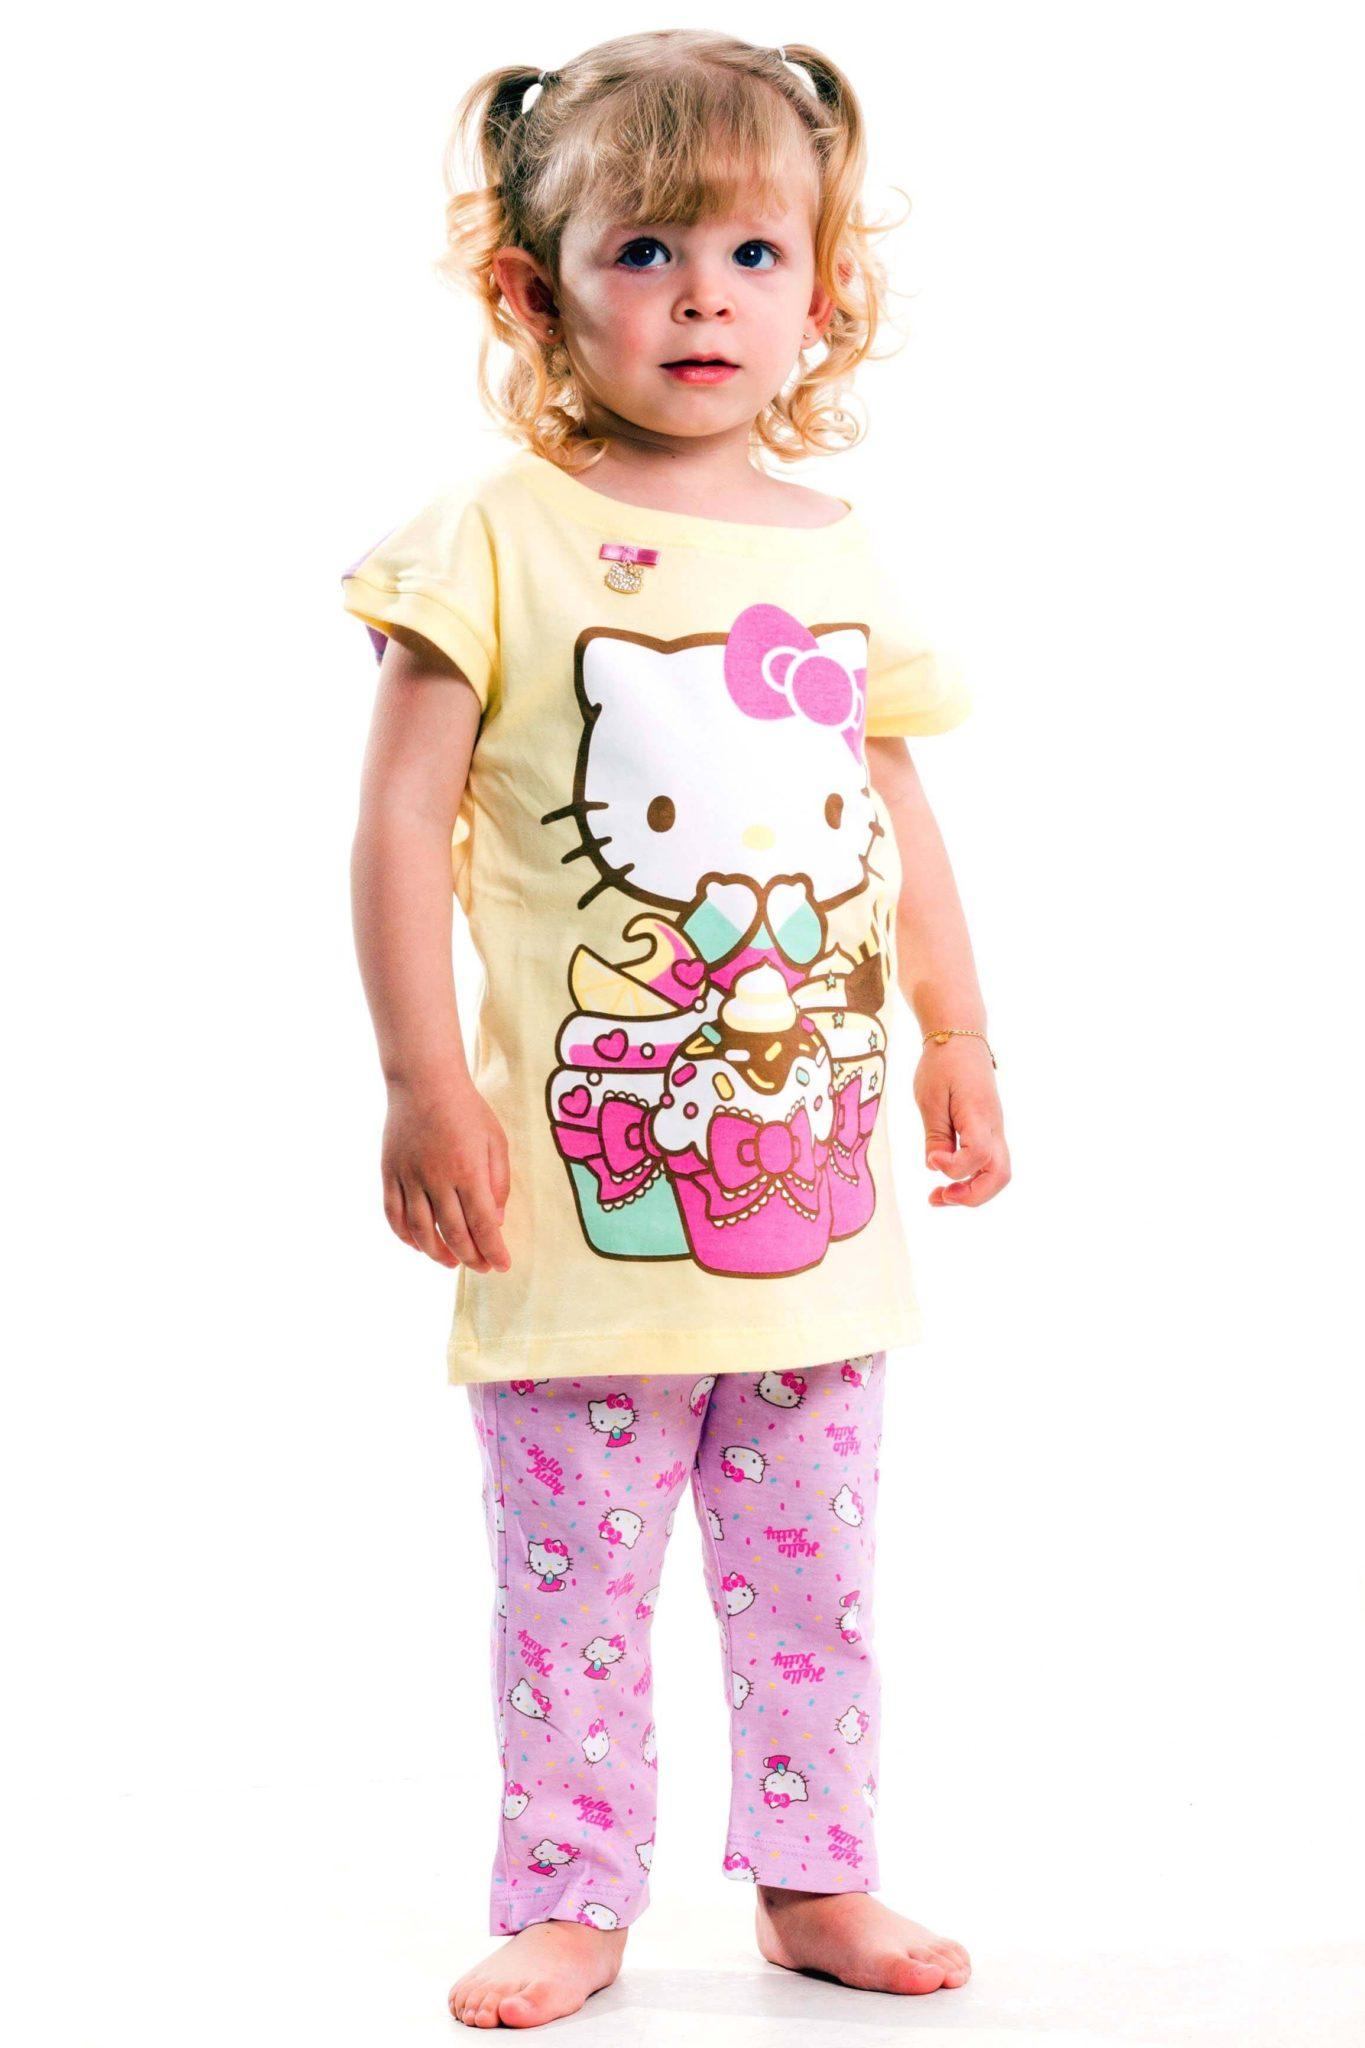 Pijama infantil Capri Kids com estampa da Hello Kitty da loja virtual Pijamas for you